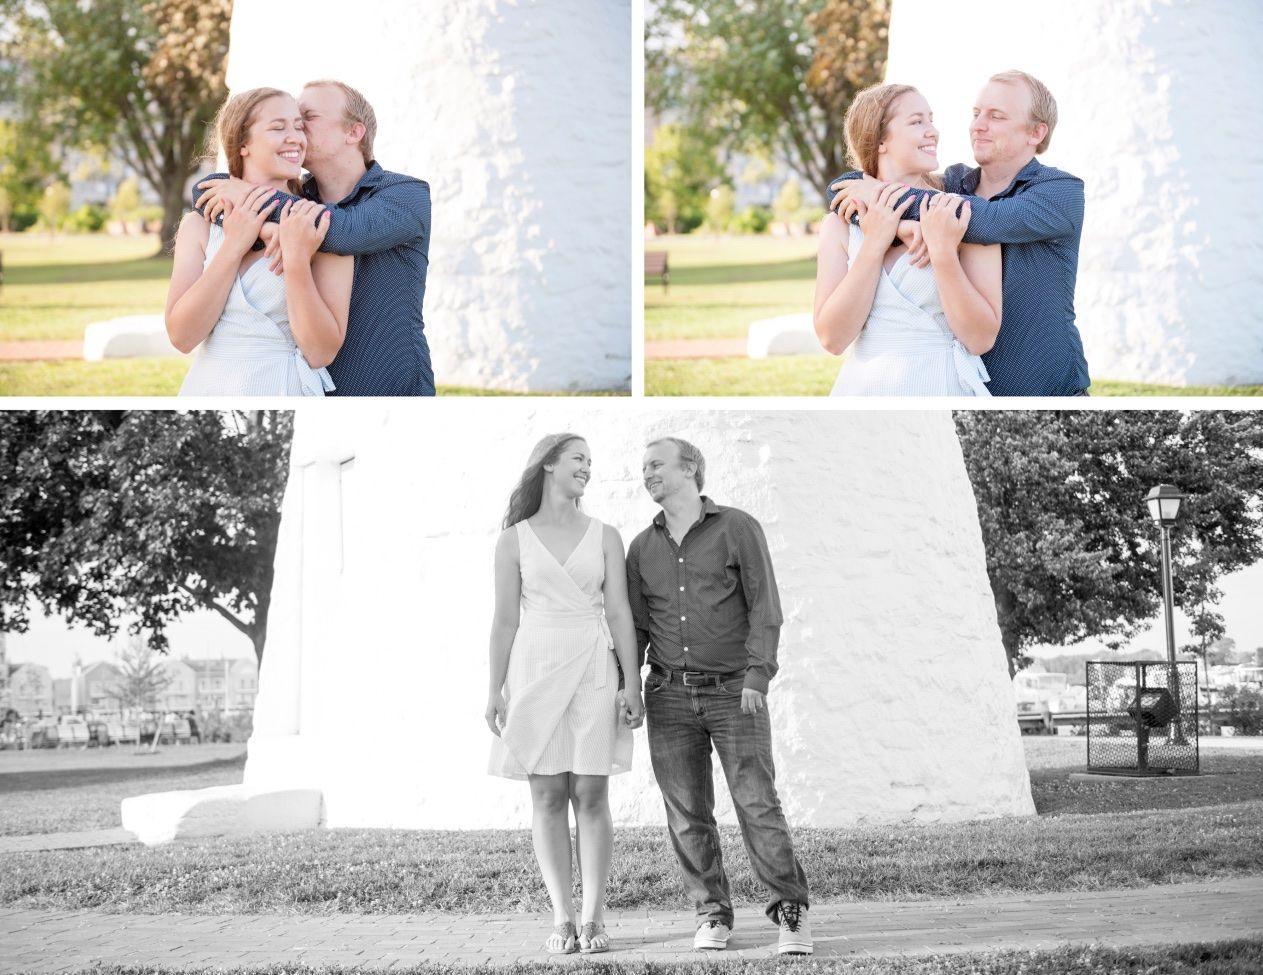 havre de grace maryland engagement photo, havre de grace maryland light house engagement photo, harford county maryland engagement photo, harford county maryland wedding photography